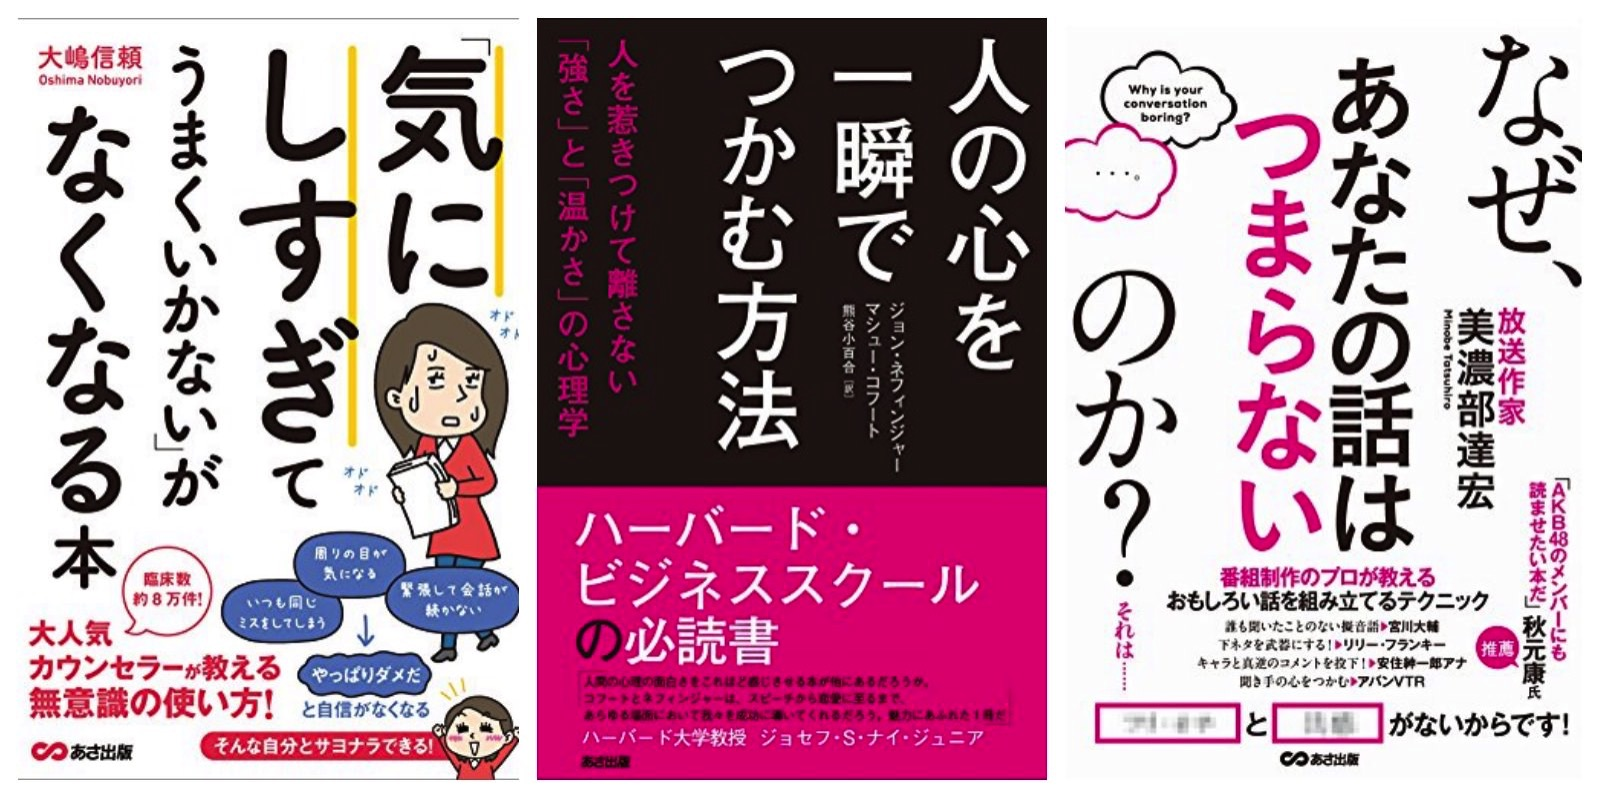 Kindle-Jitsuyosho-Sale-.jpg